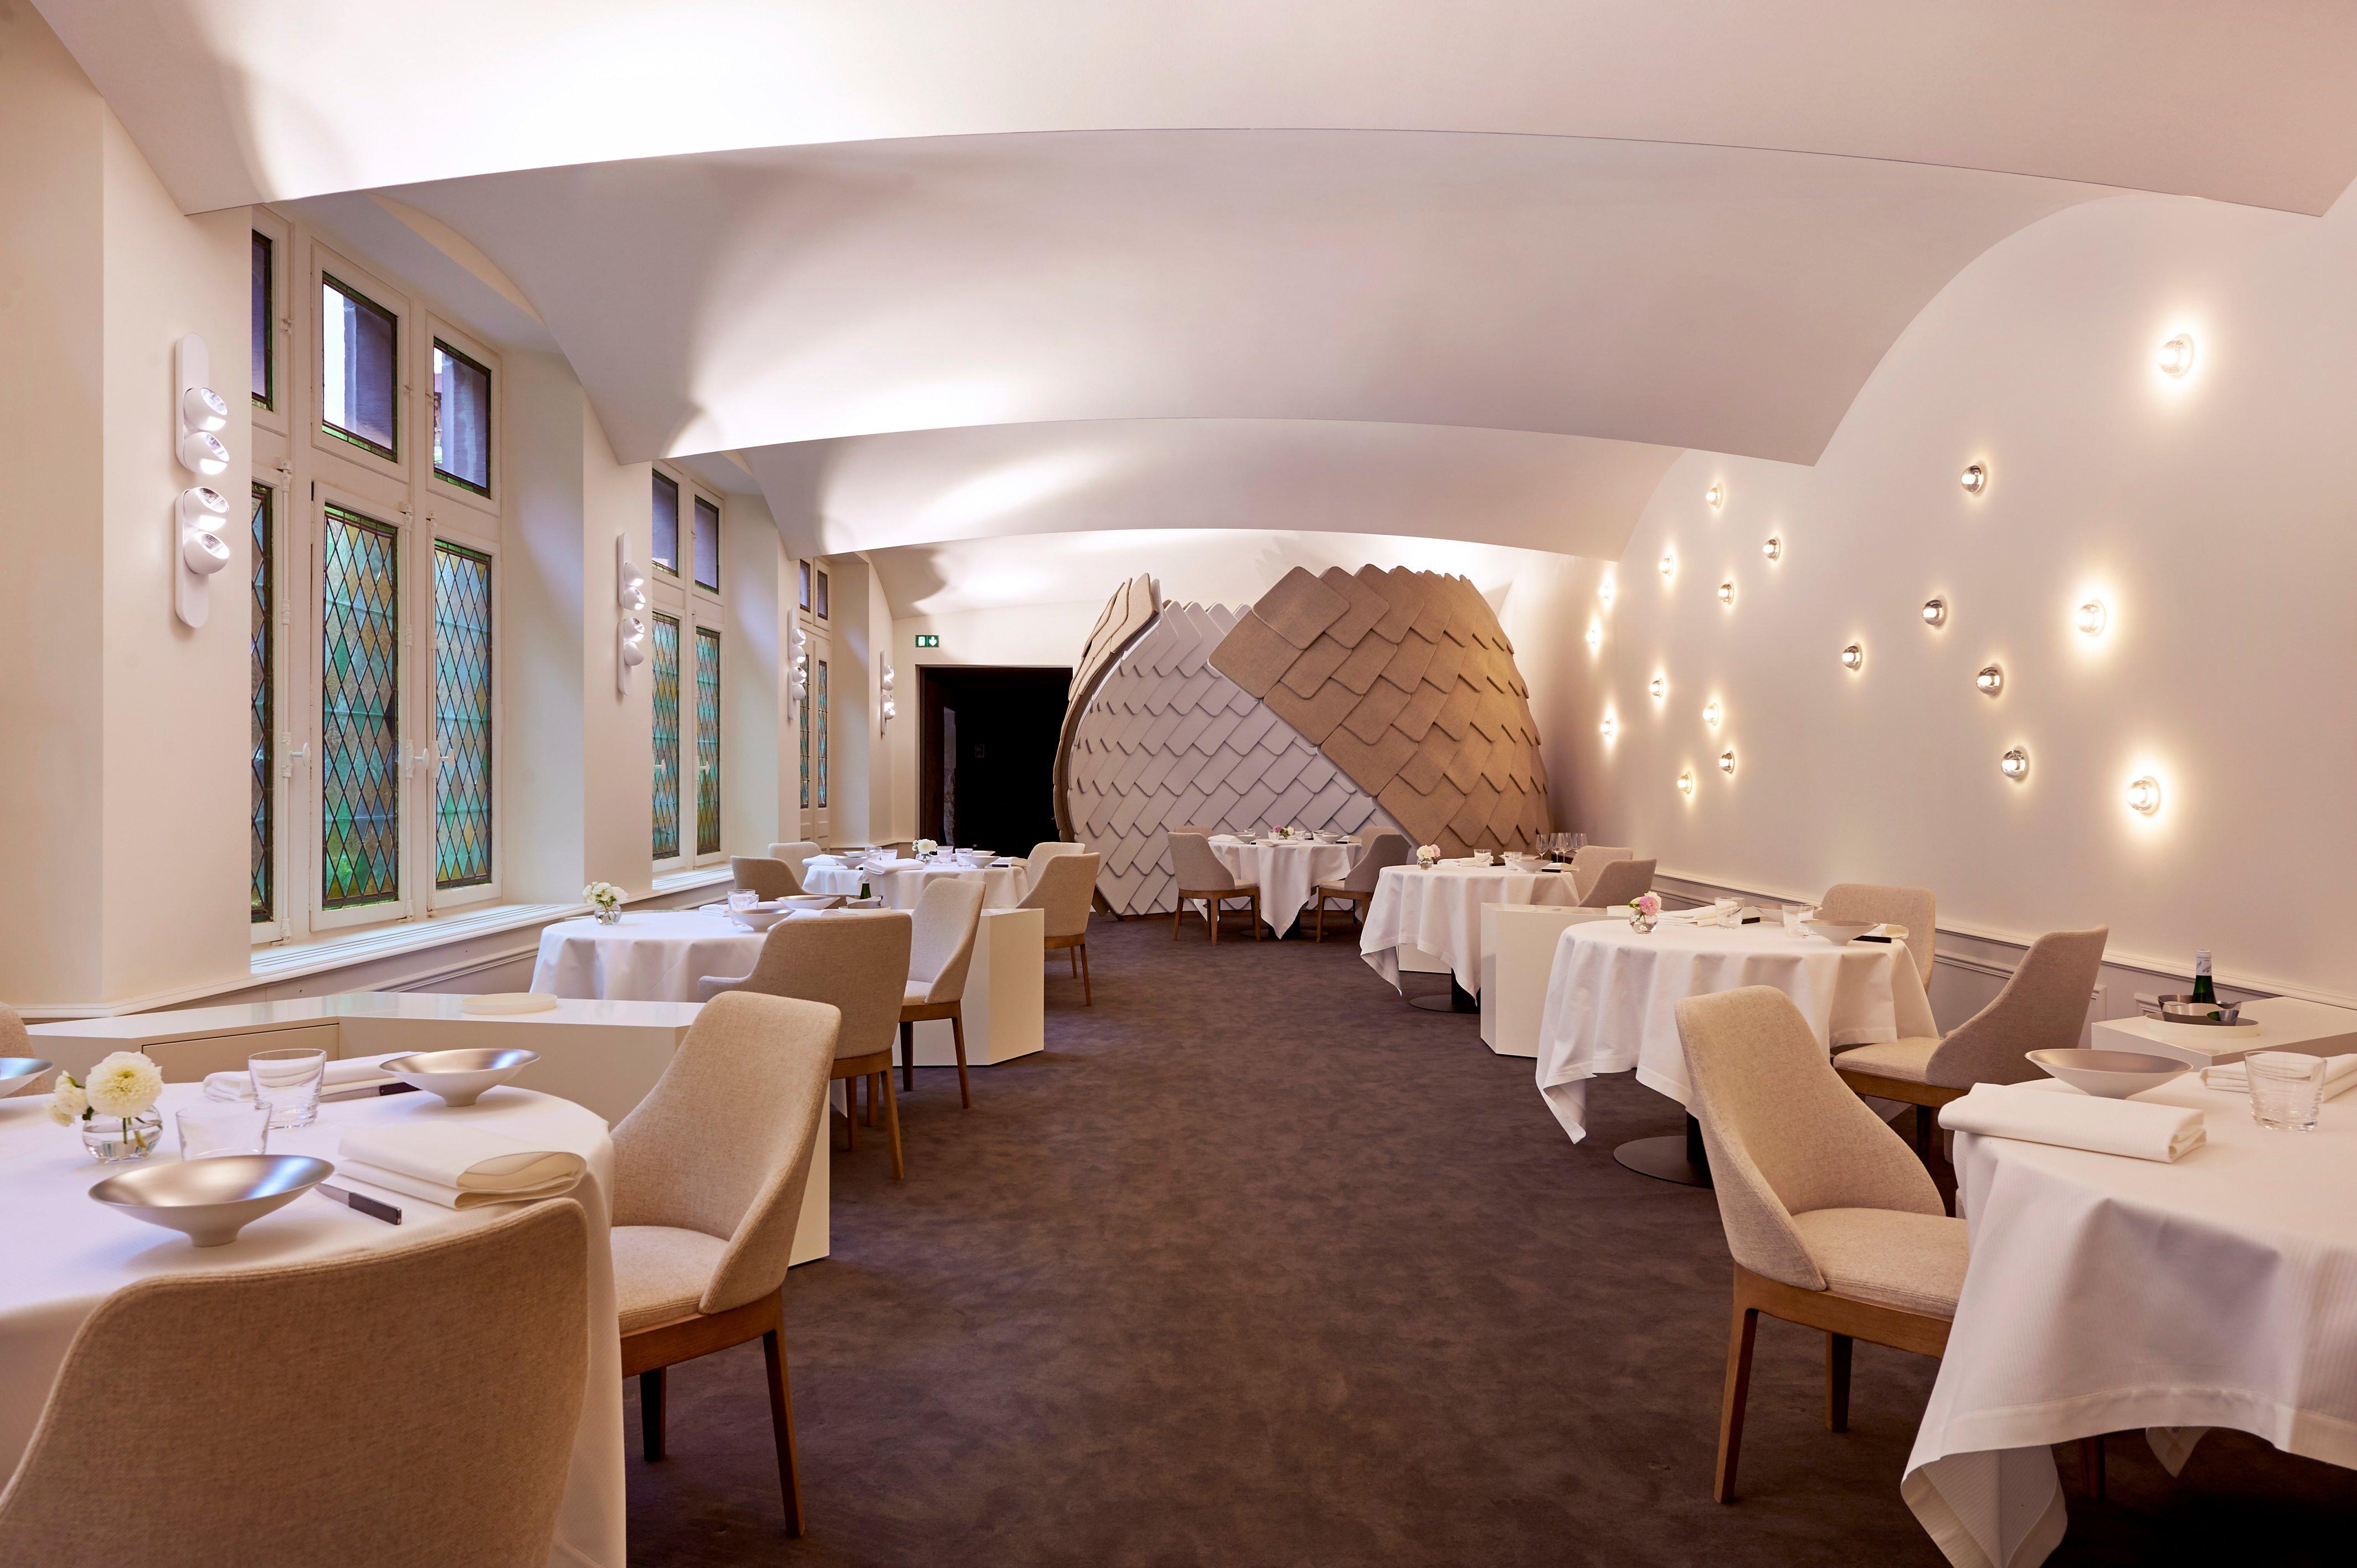 Top 3 Contemporary food in Wintzenheim, France